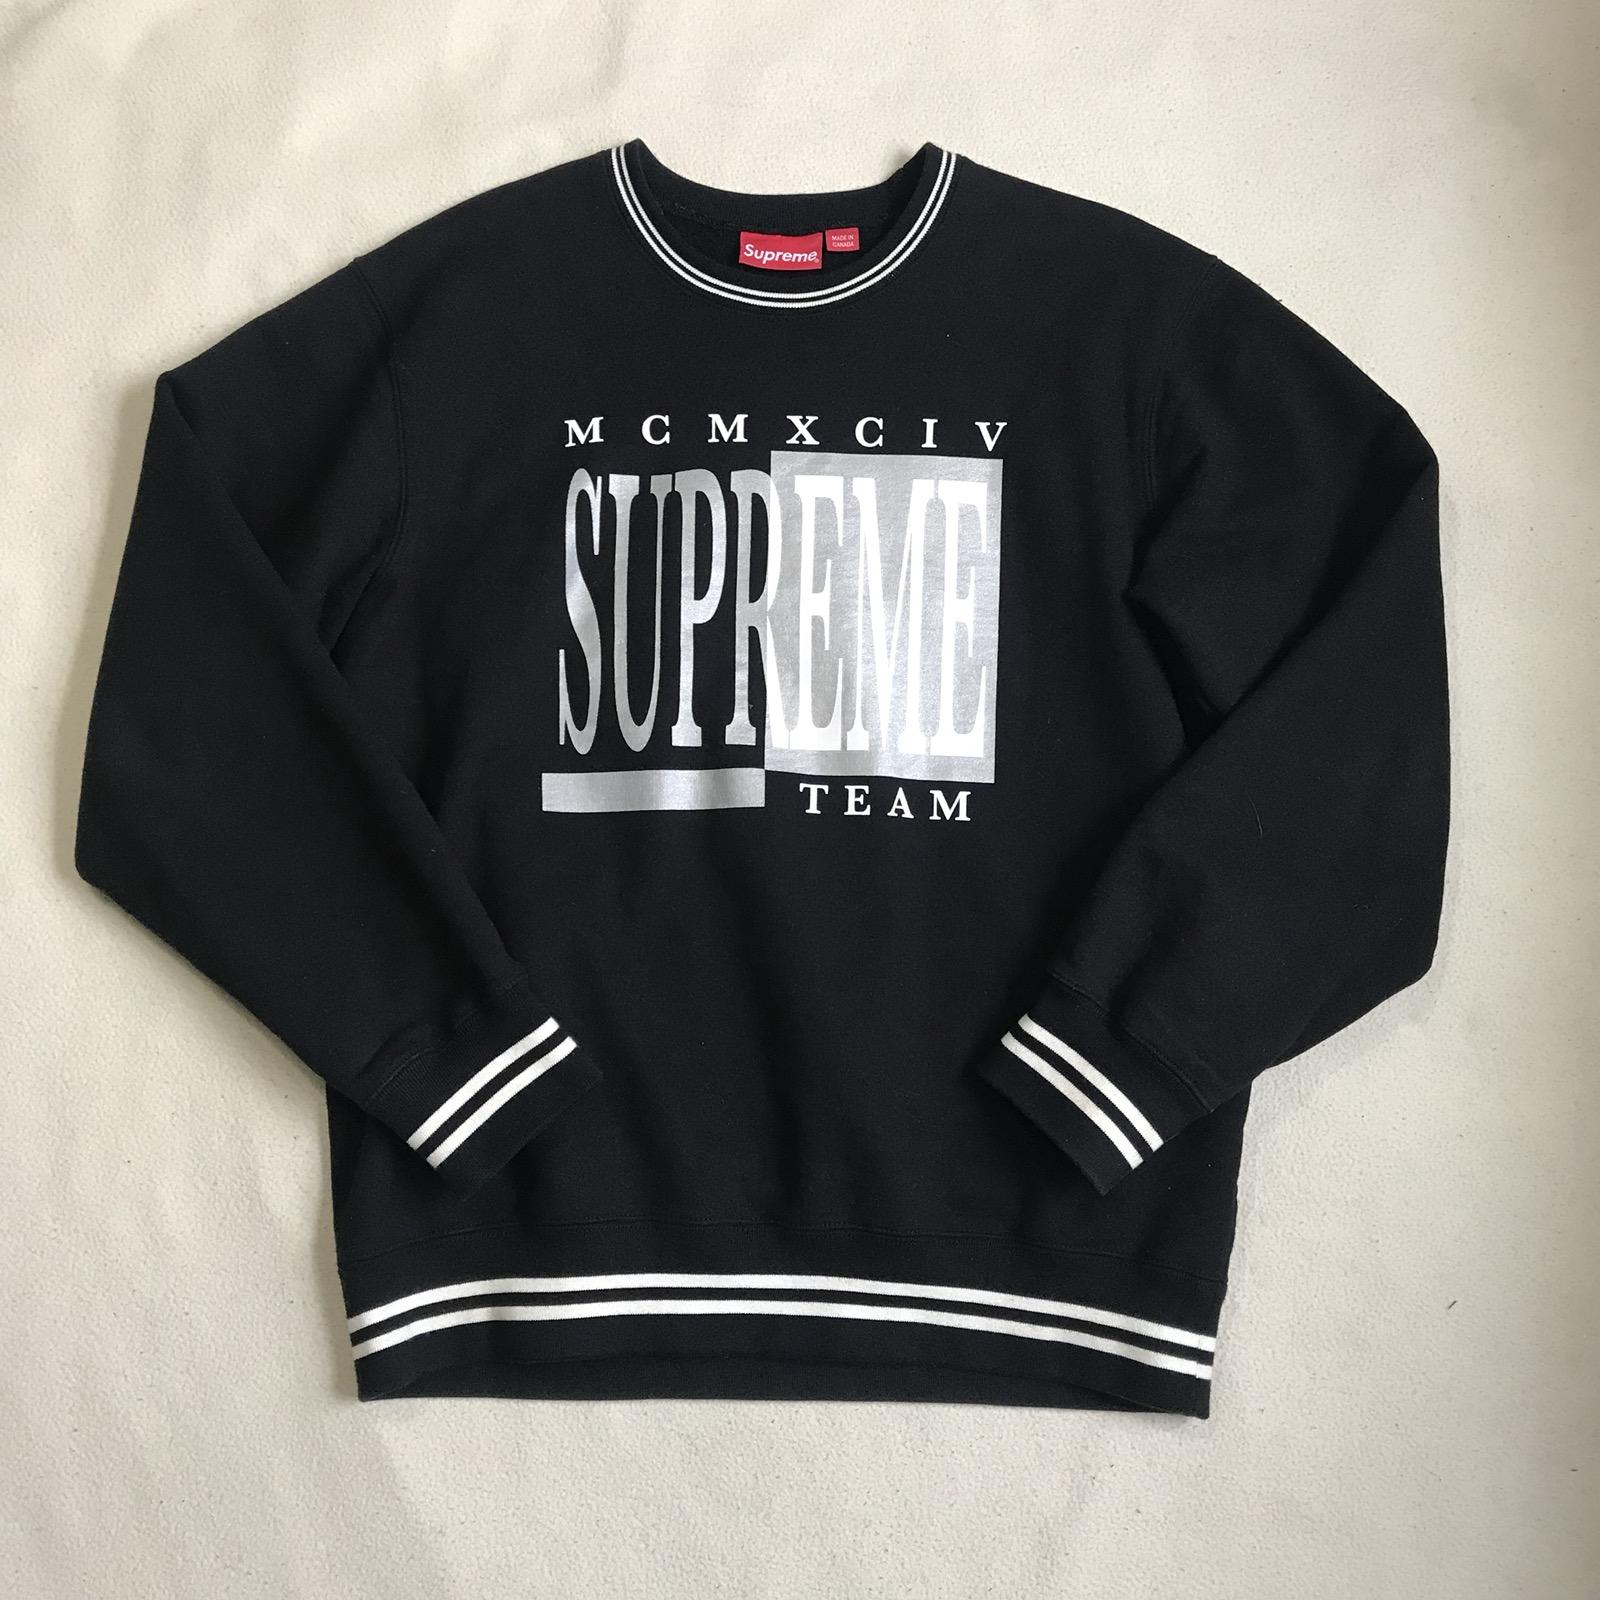 1b5d4c899afd Supreme Supreme Team Crewneck Size l - Sweatshirts   Hoodies for Sale -  Grailed